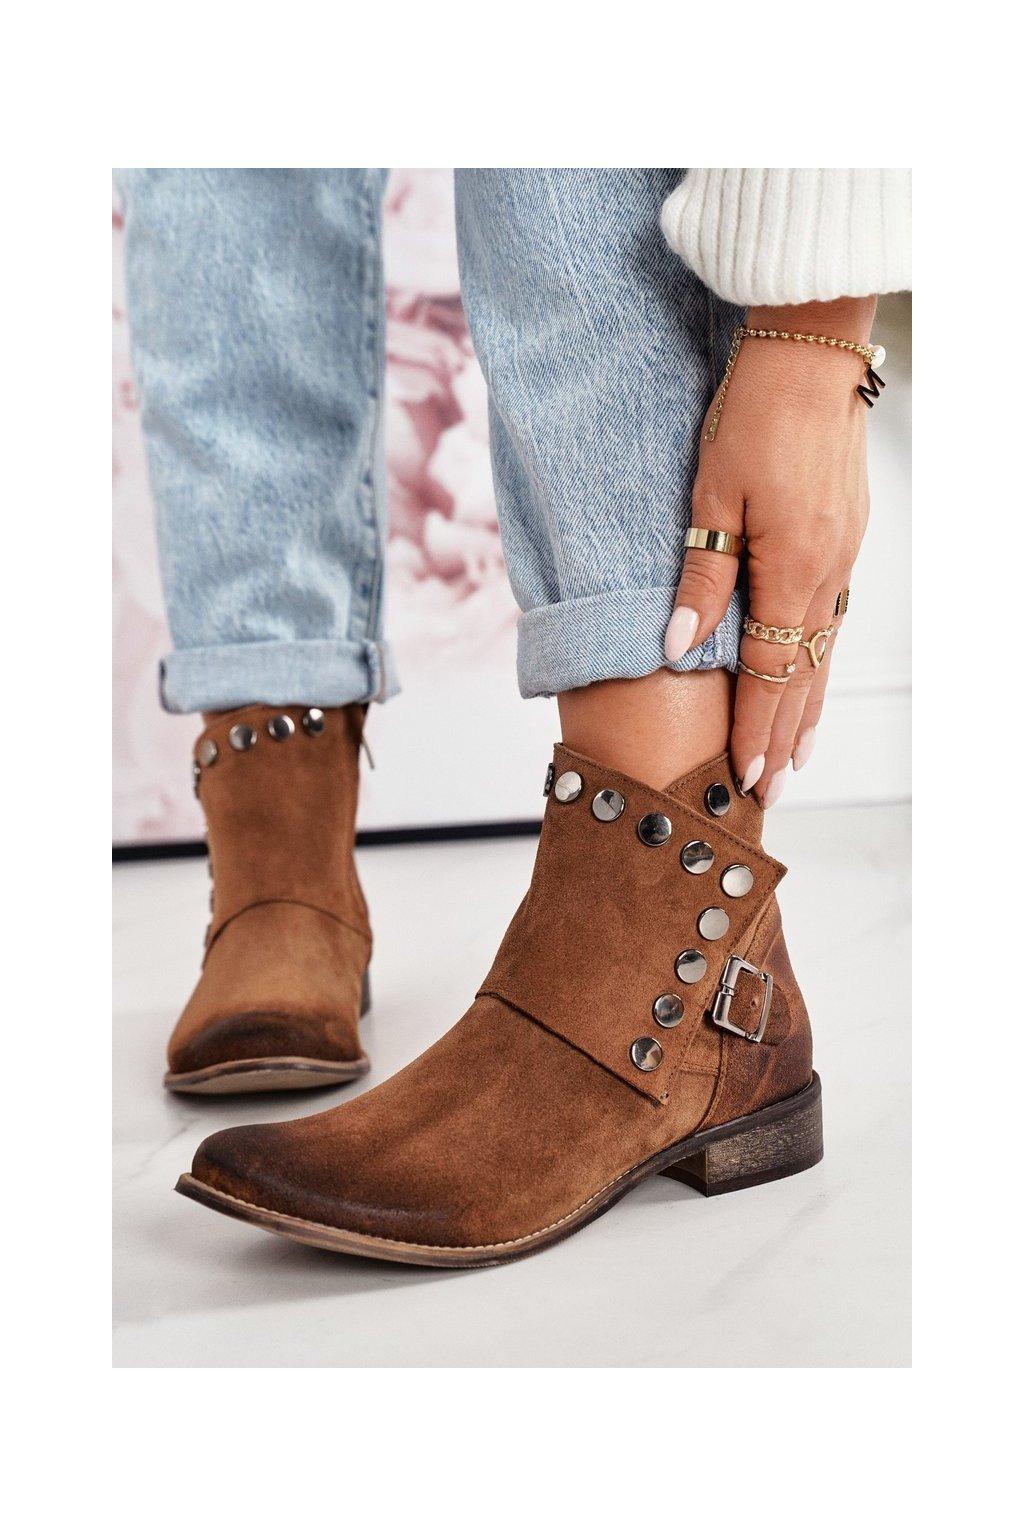 Členkové topánky na podpätku farba hnedá kód obuvi 1198 KONIAK.WELUR